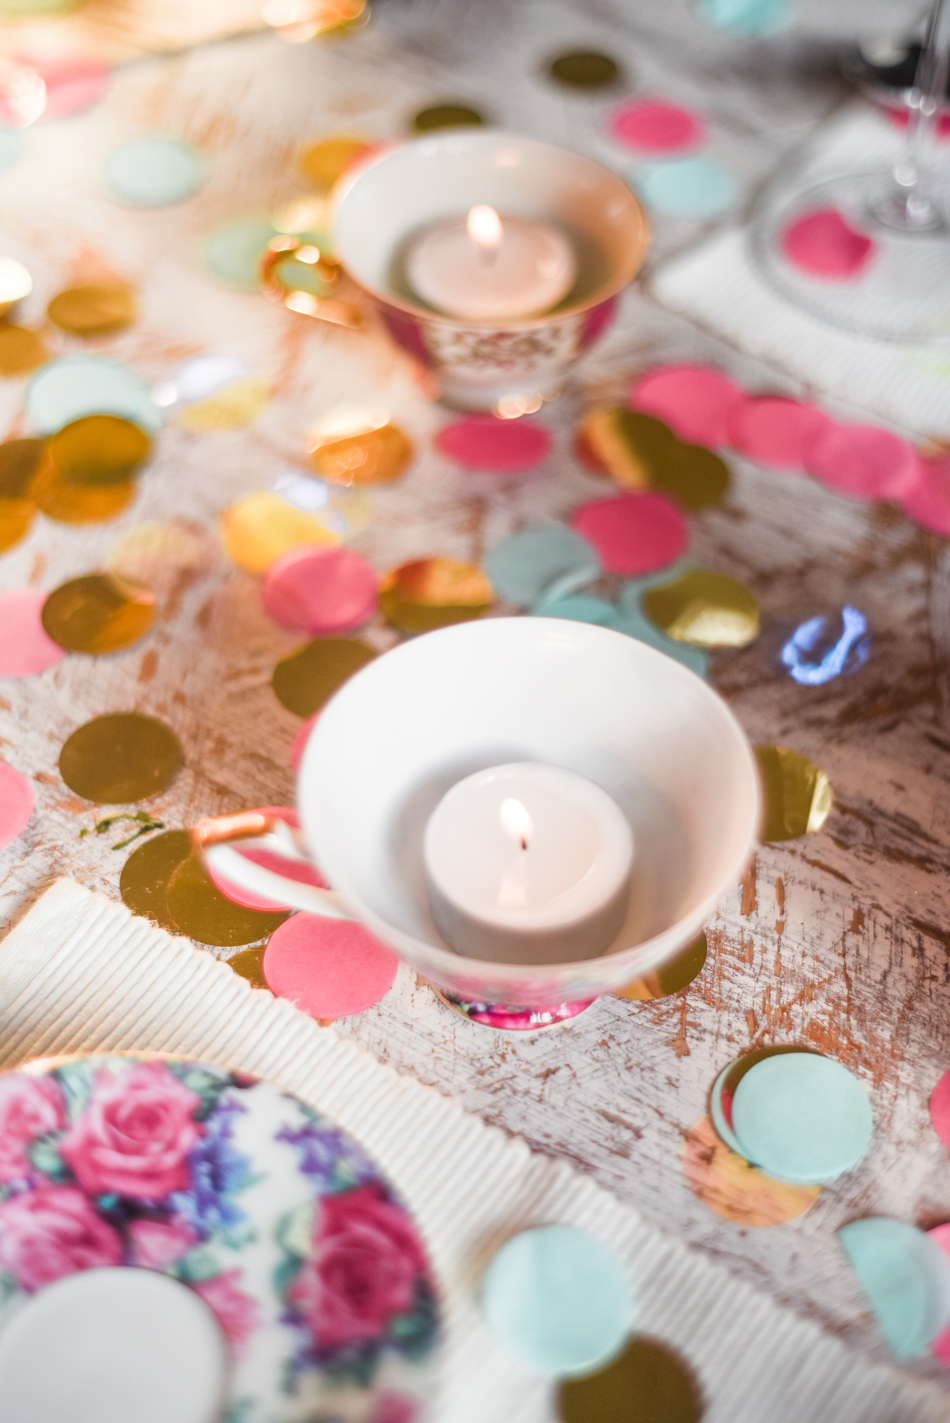 Valentinesday-table-setting-decor-styling-AnaisStoelen-11.jpg